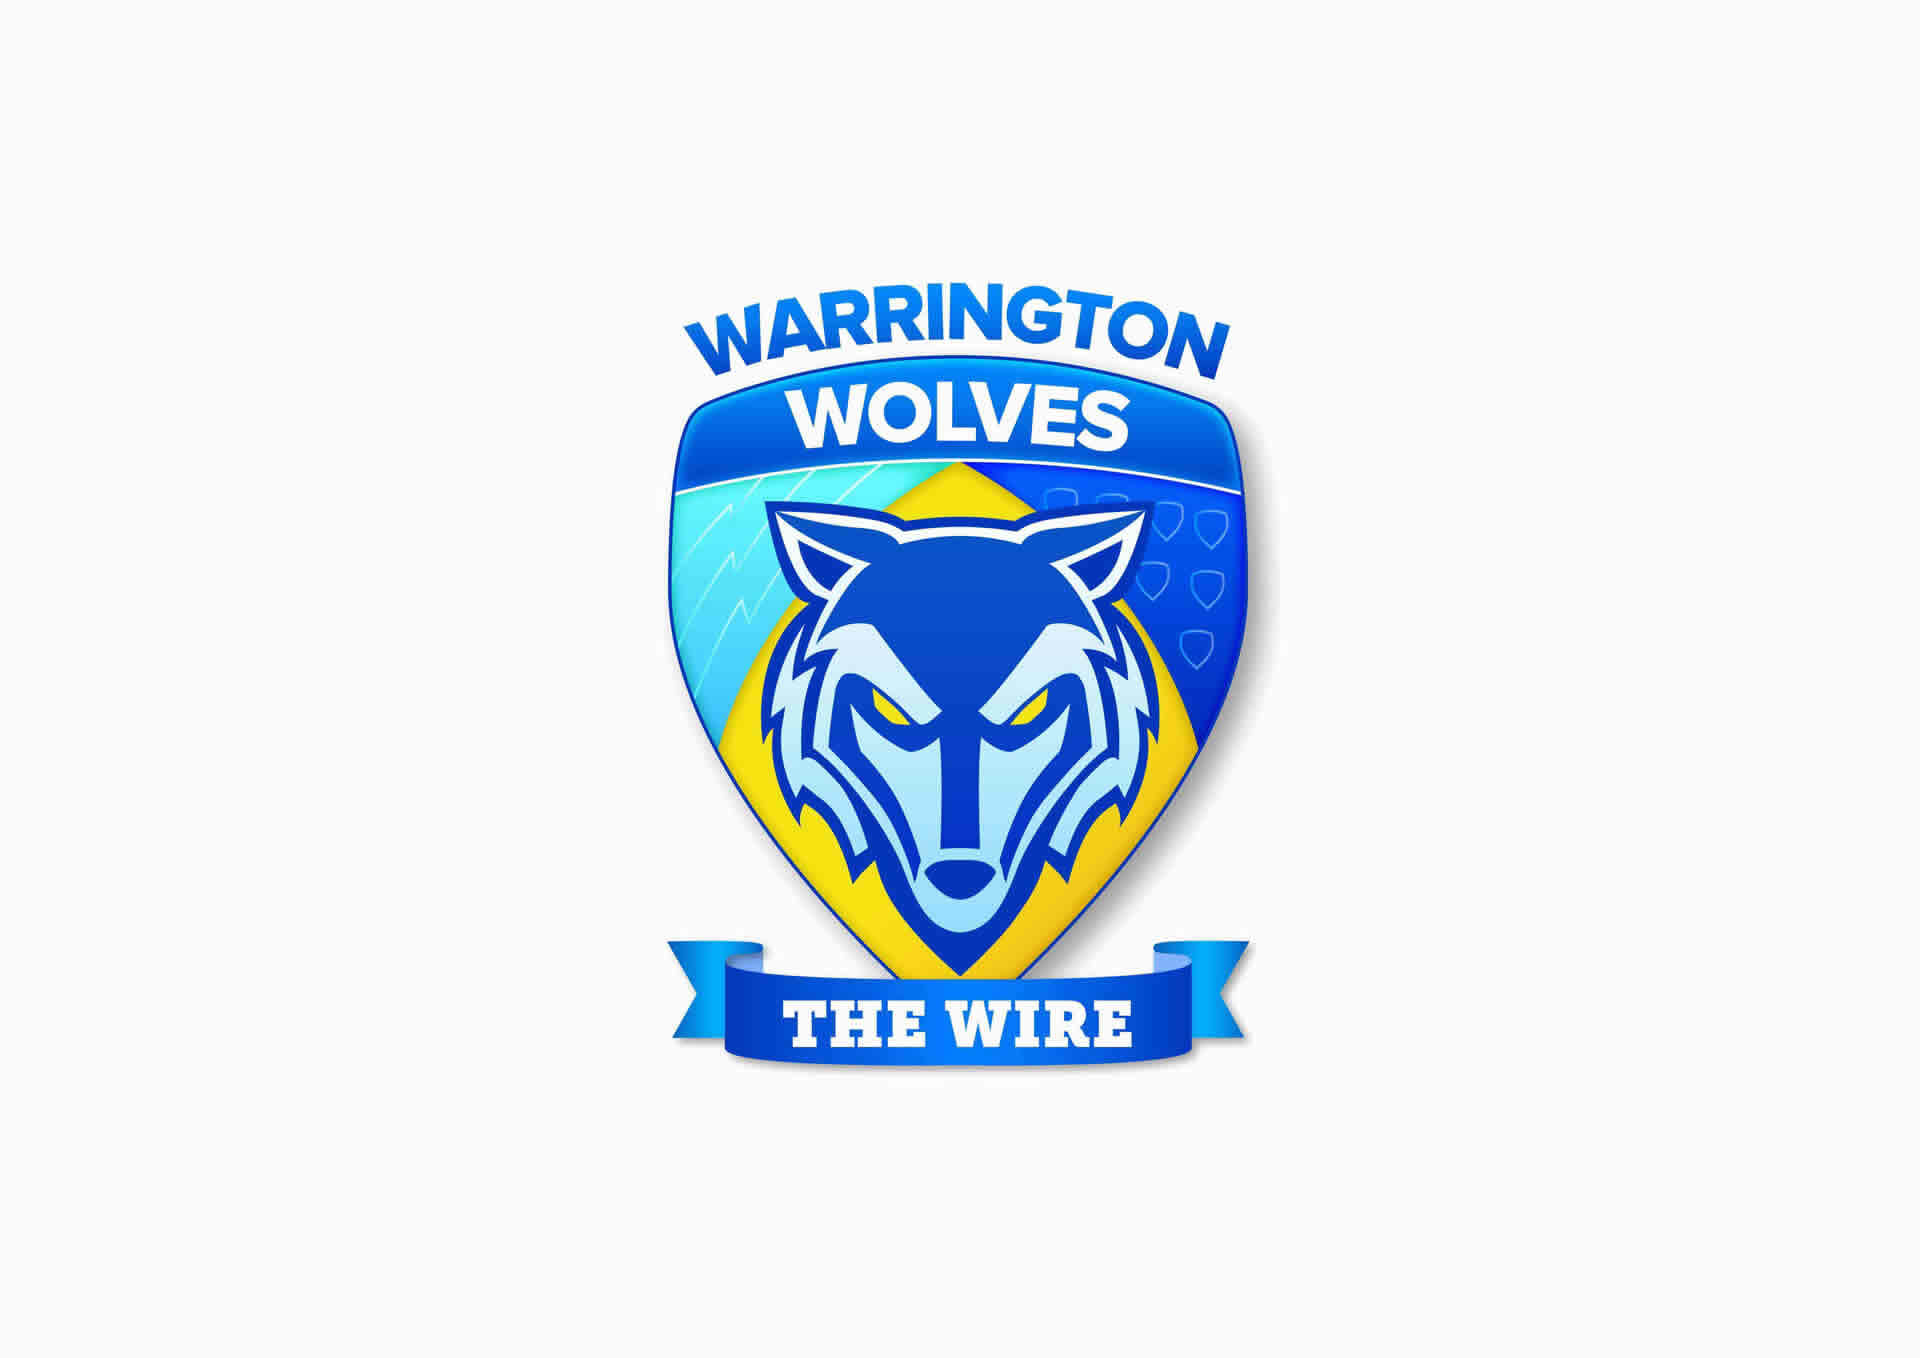 halliwell jones warrington meet the team logo